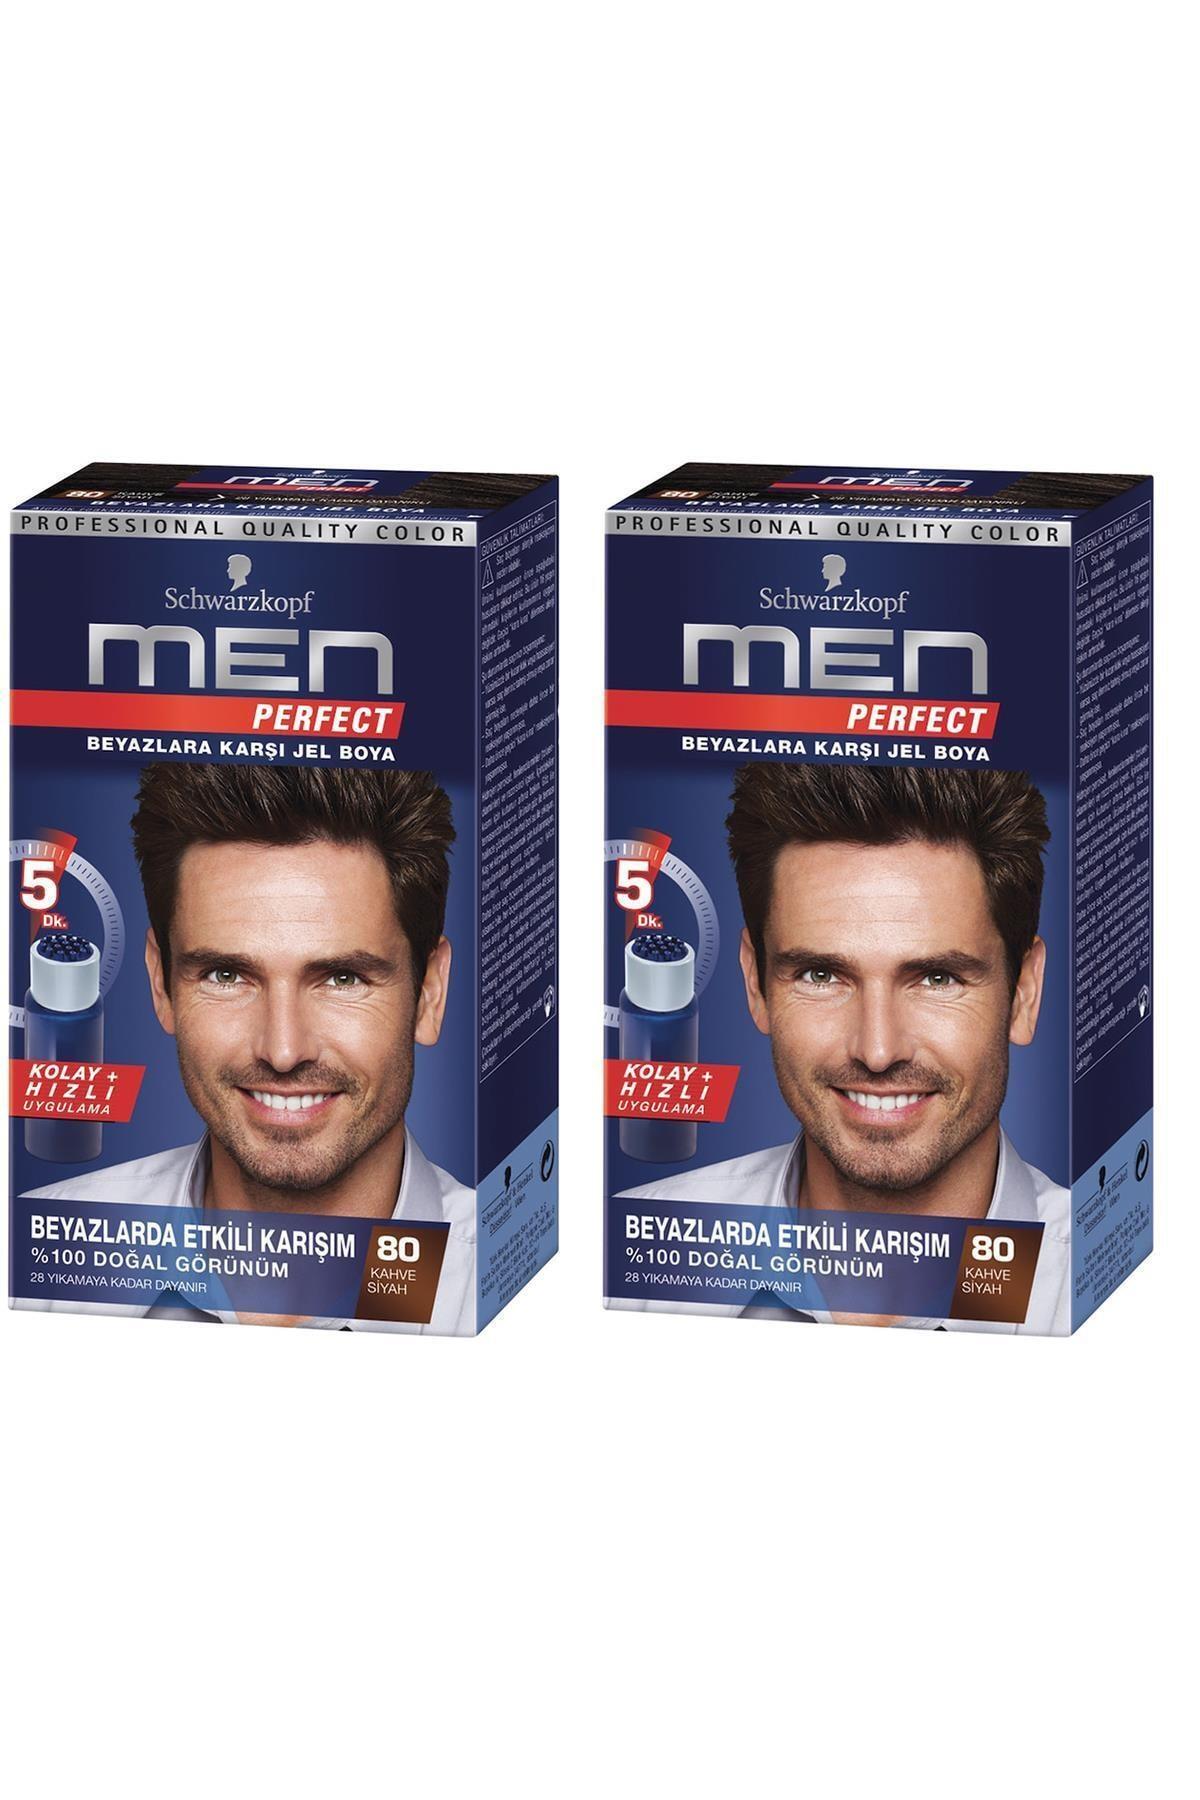 SCHWARZKOPF HAIR MASCARA Perfect Men 80 Siyah Kahve Saç Boyası x 2 adet 1